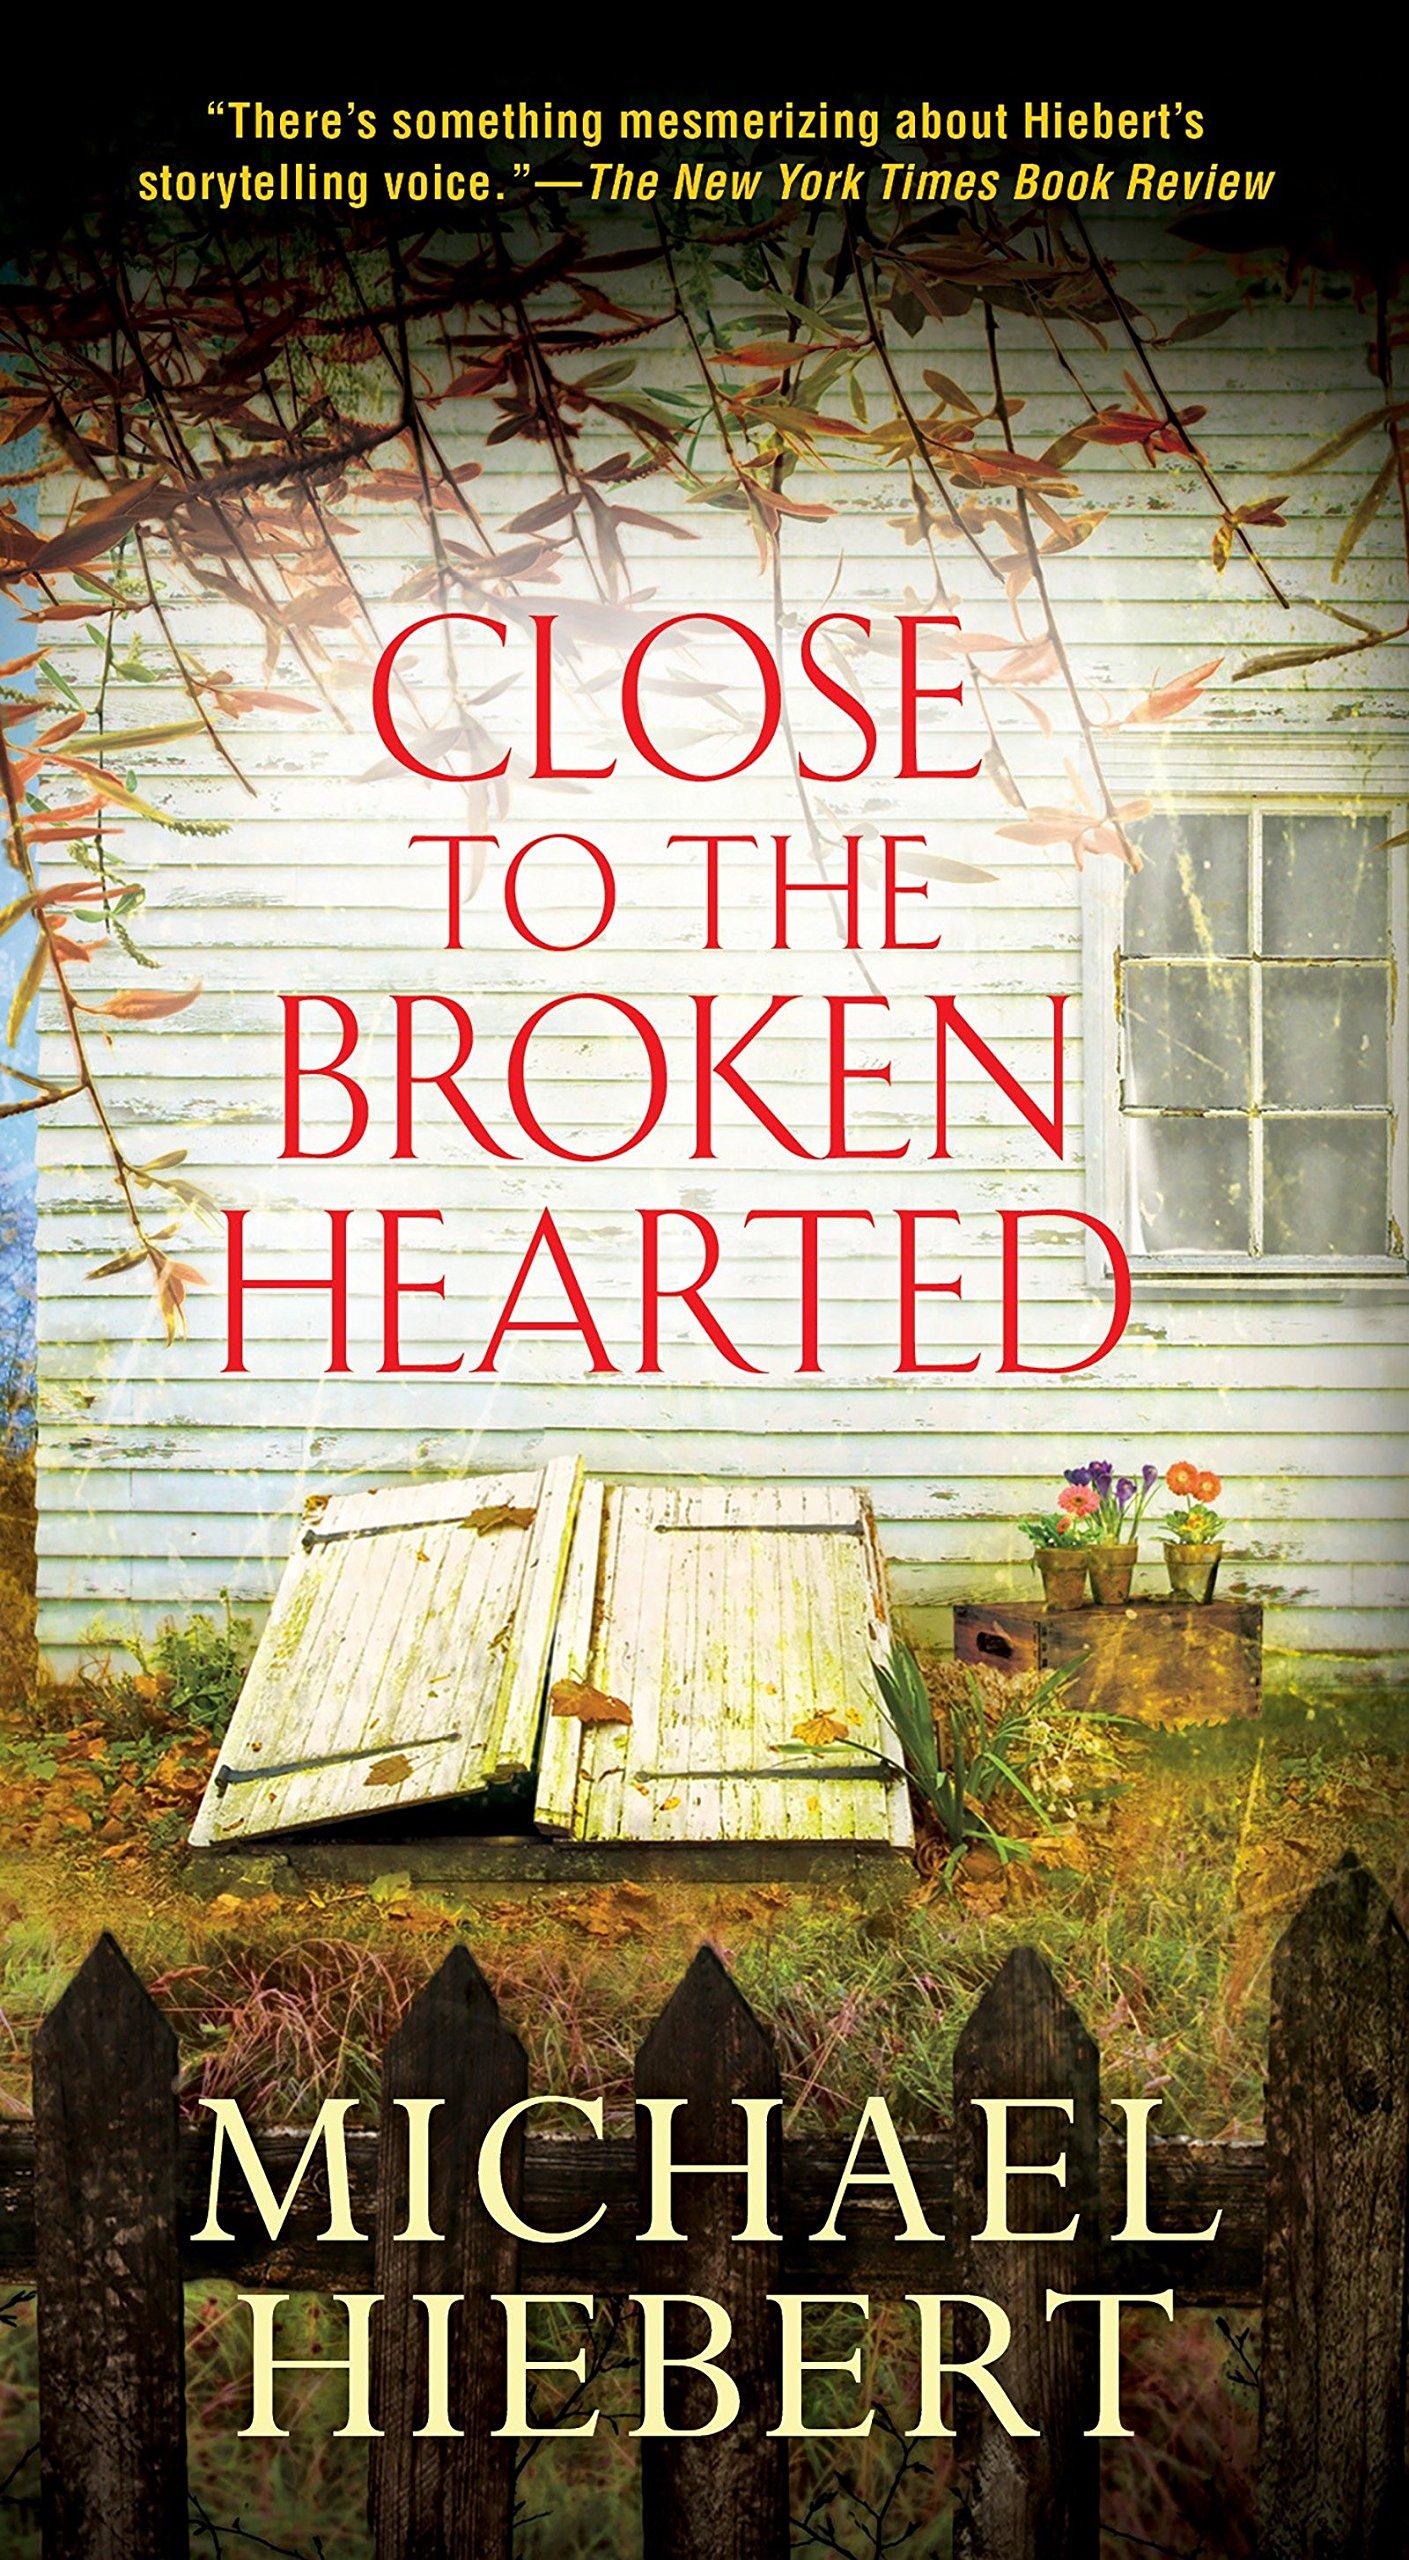 Download Close To the Broken Hearted (An Alvin, Alabama Novel) pdf